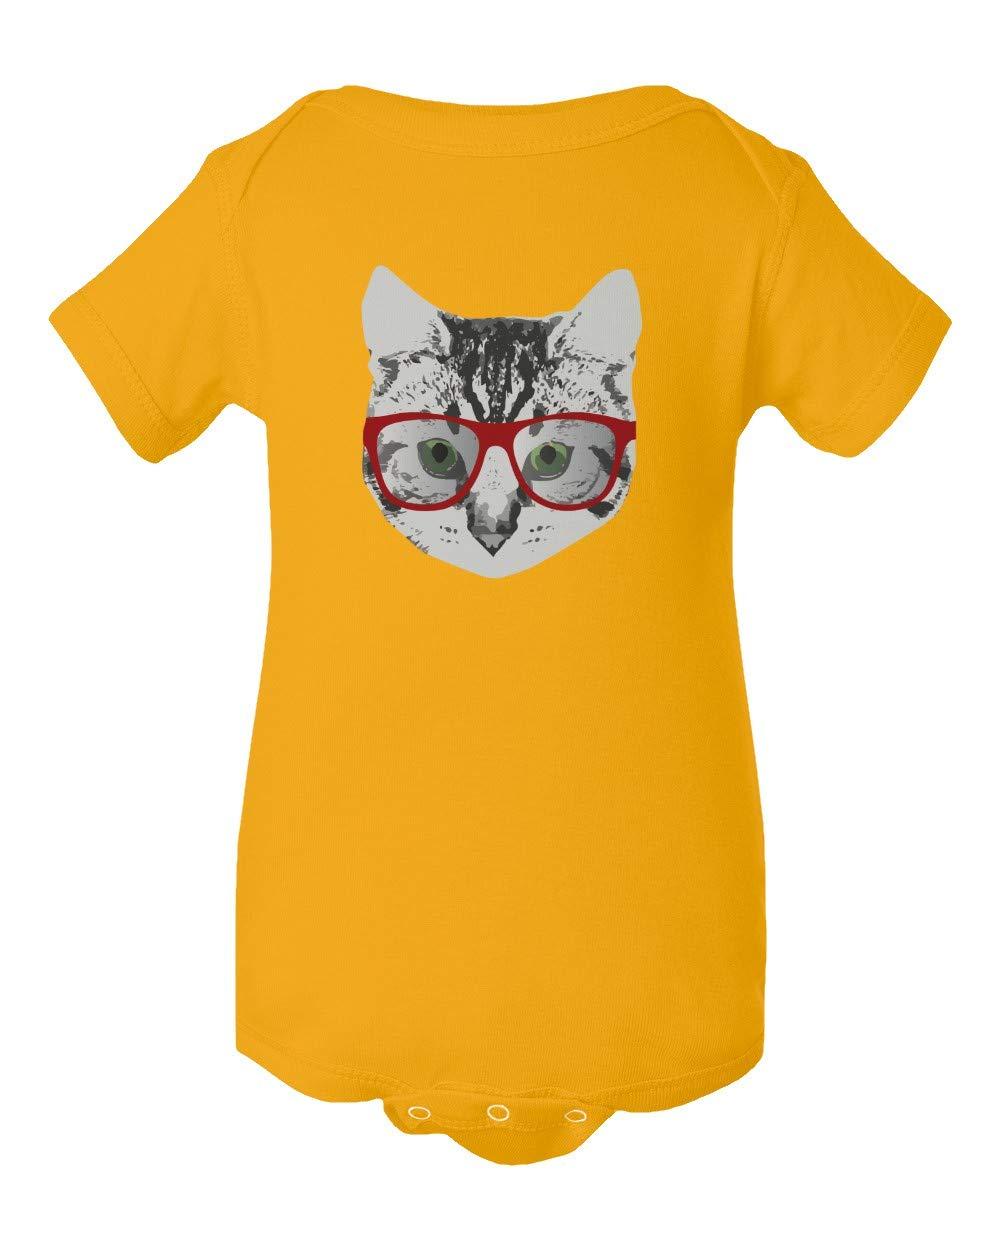 Red Linda Glasses Cat Funny Belcher Kitty Cute Humor Fun Short Sleeve Summer Romper Bodysuit (Gold,NB) by Societee